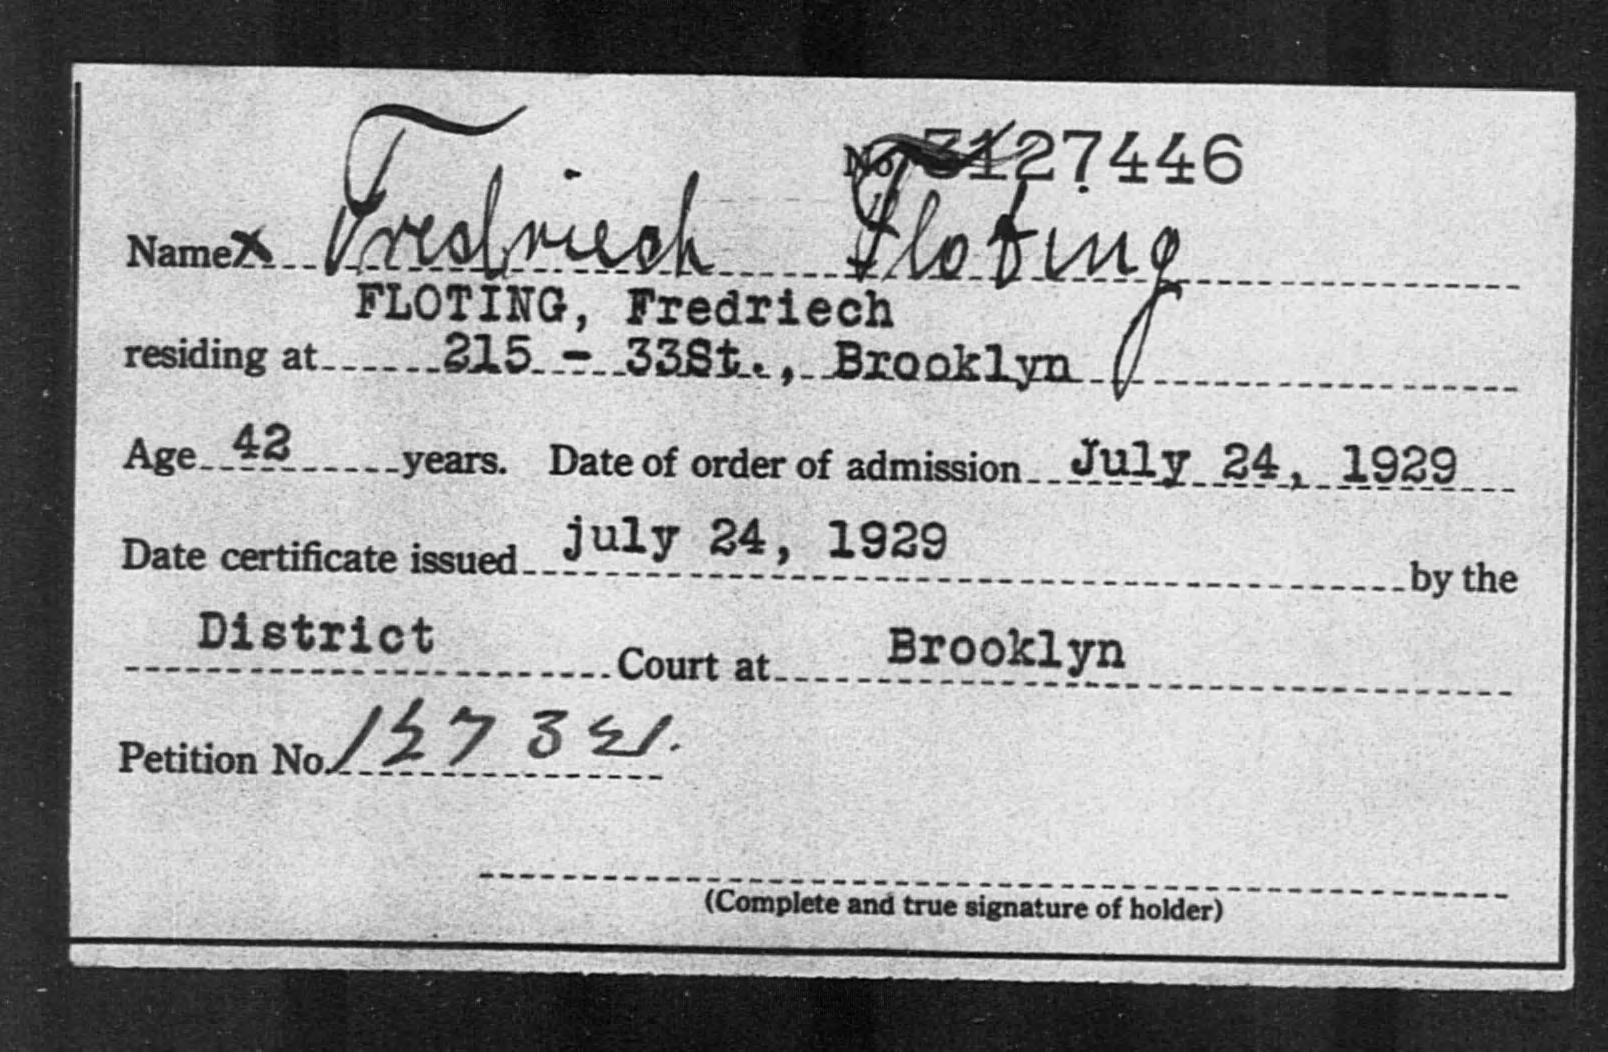 FLOTING, Fredriech - Born: [BLANK], Naturalized: 1929